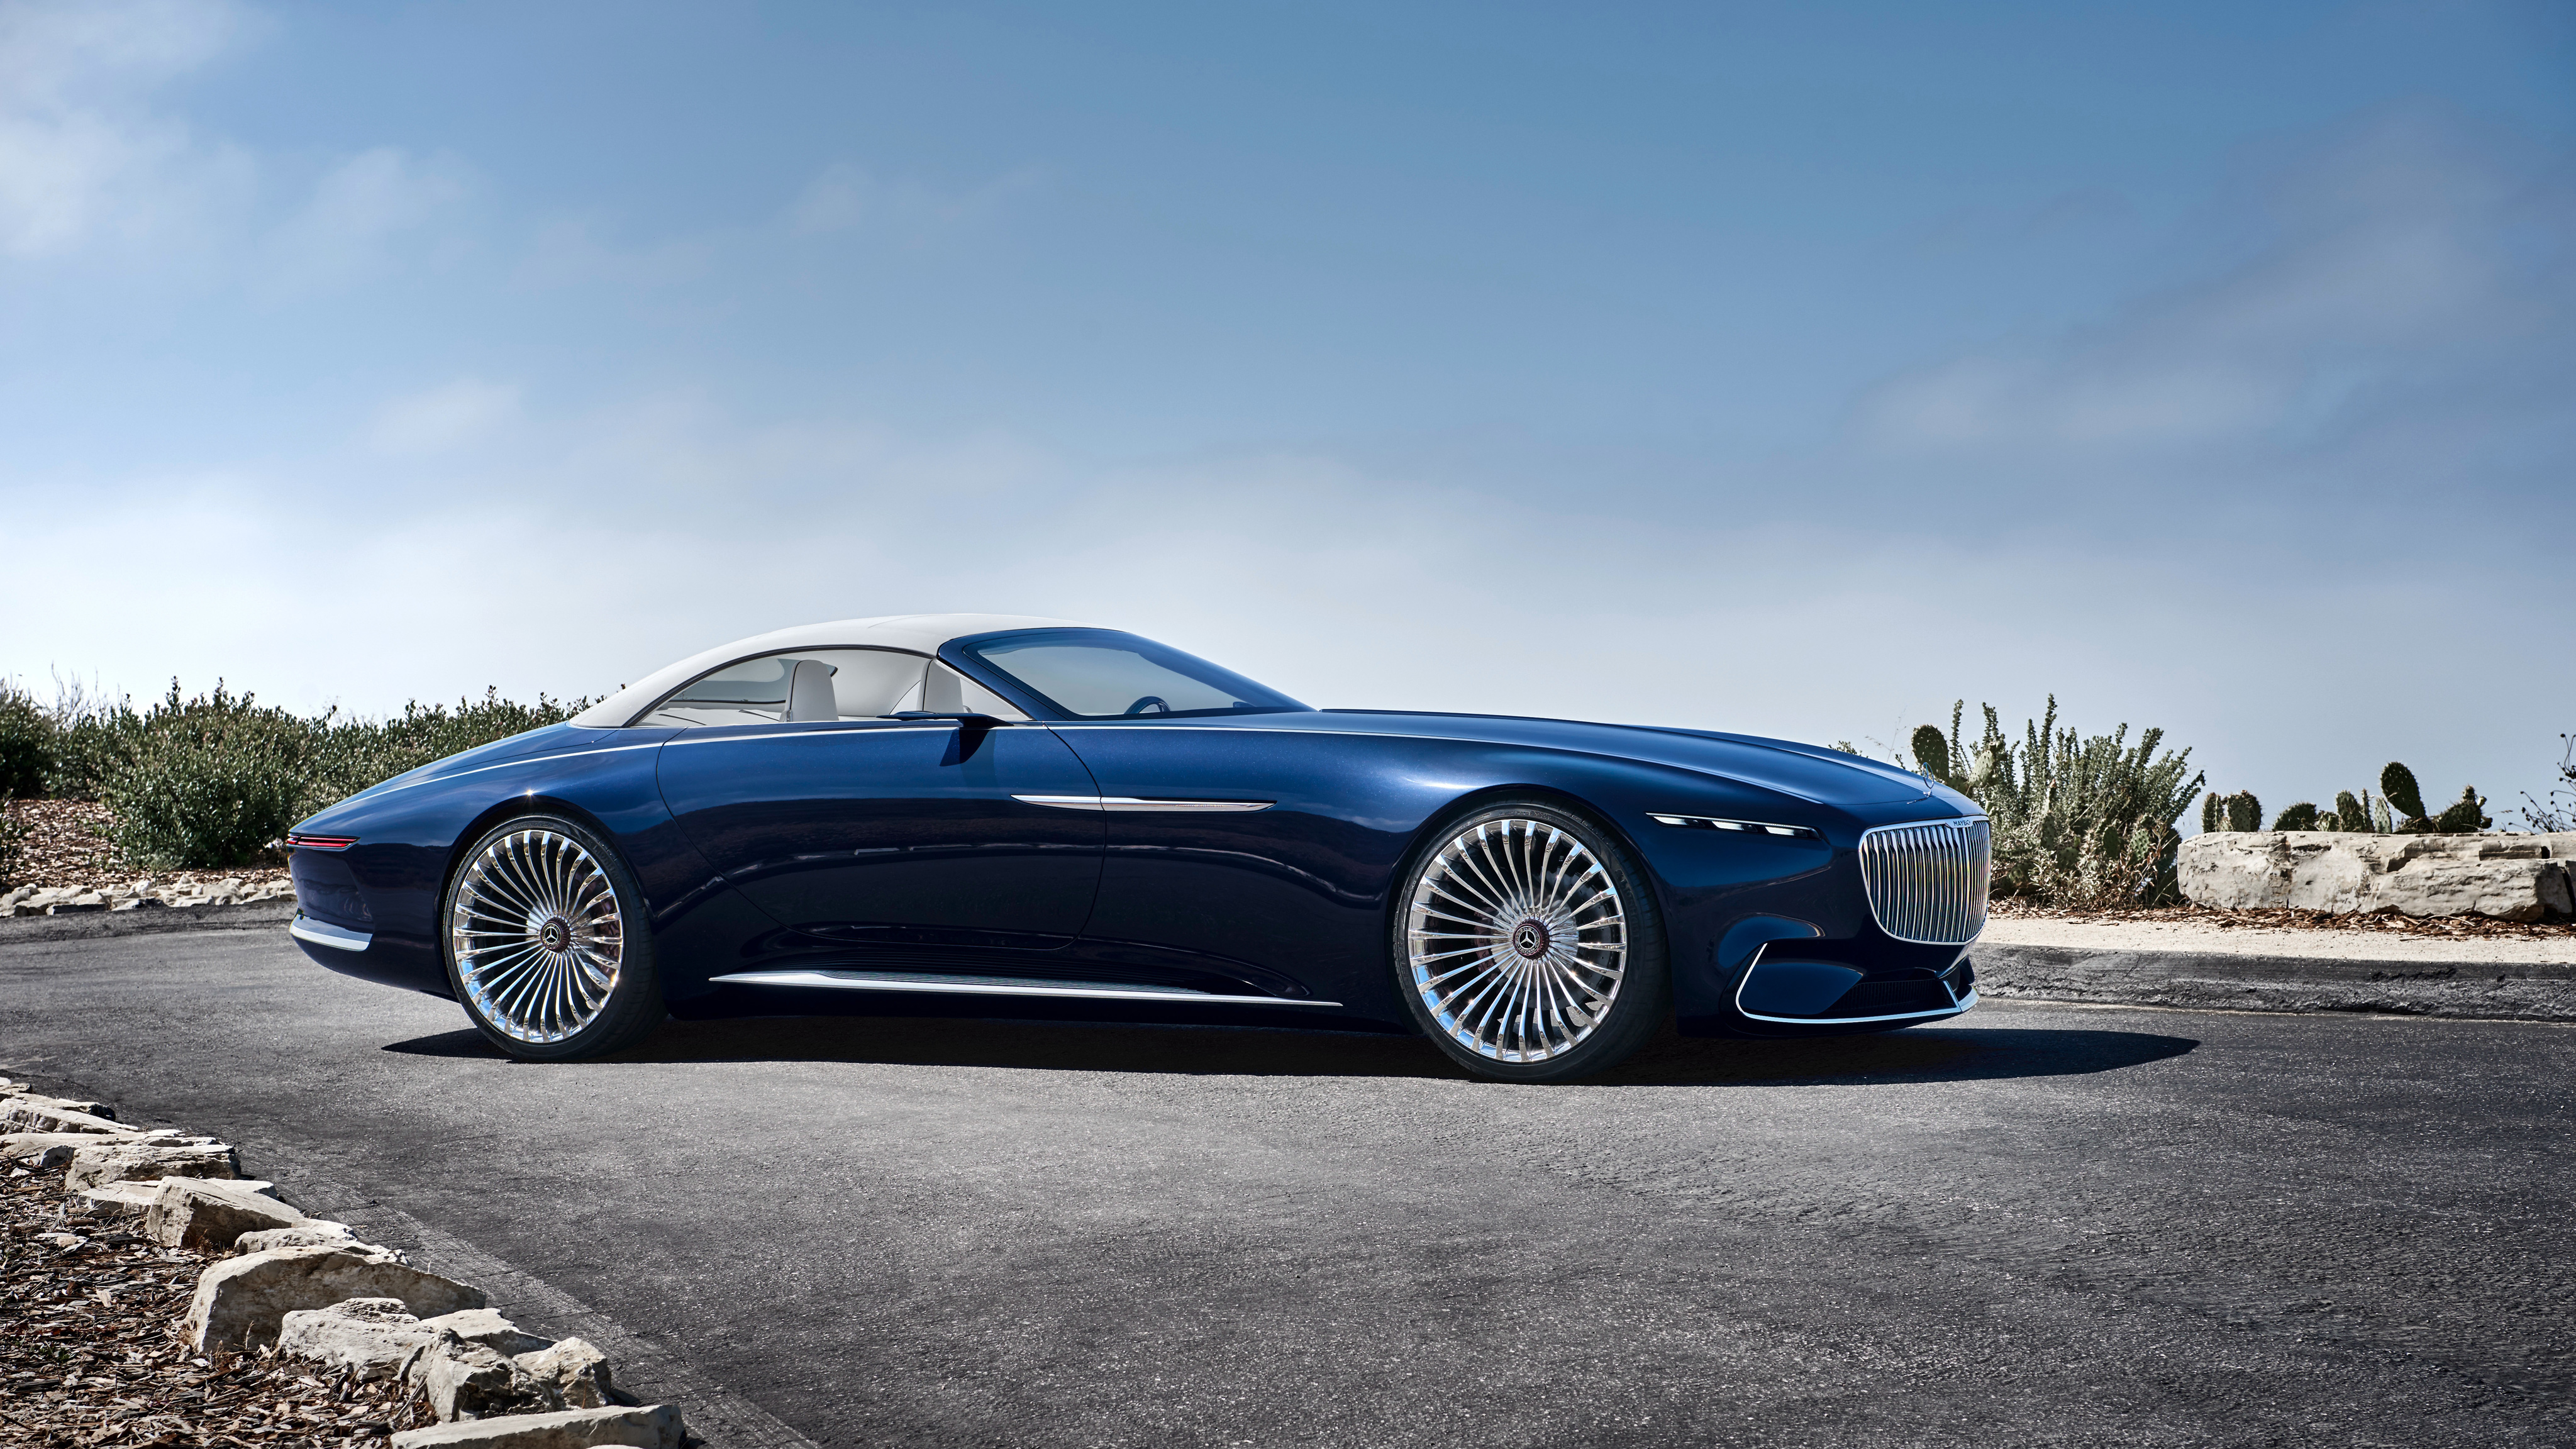 2018 vision mercedes maybach 6 cabriolet 4 wallpaper | hd car